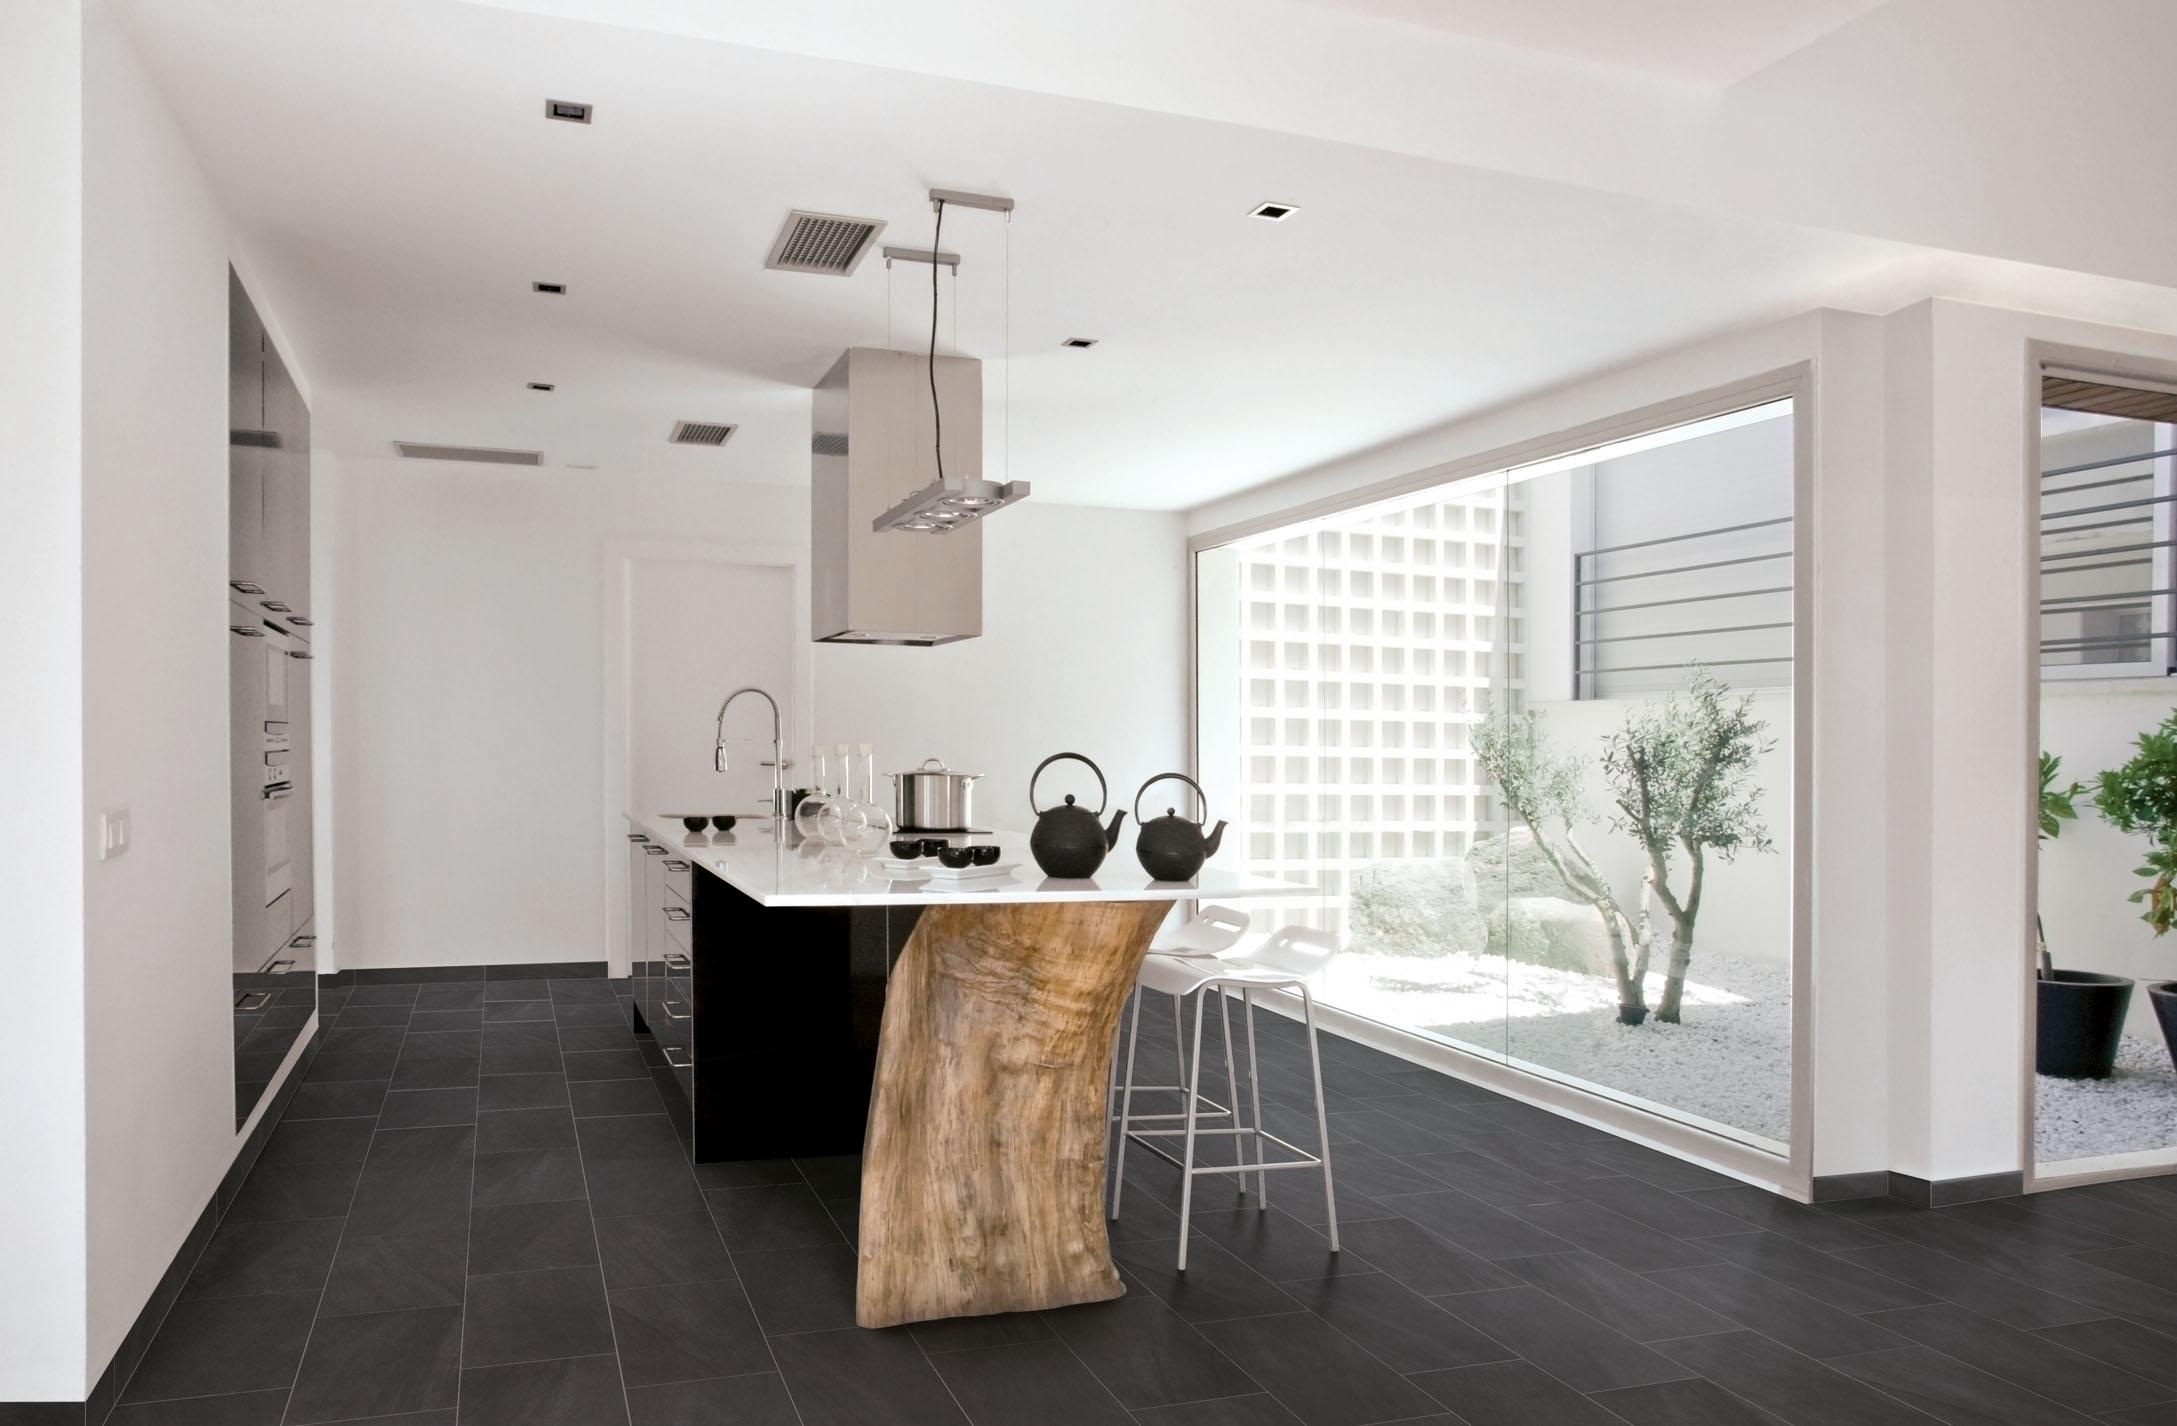 piastrelle gres porcellanato per cucina: piastrelle pavimento ... - Gres Porcellanato Cucina Moderna